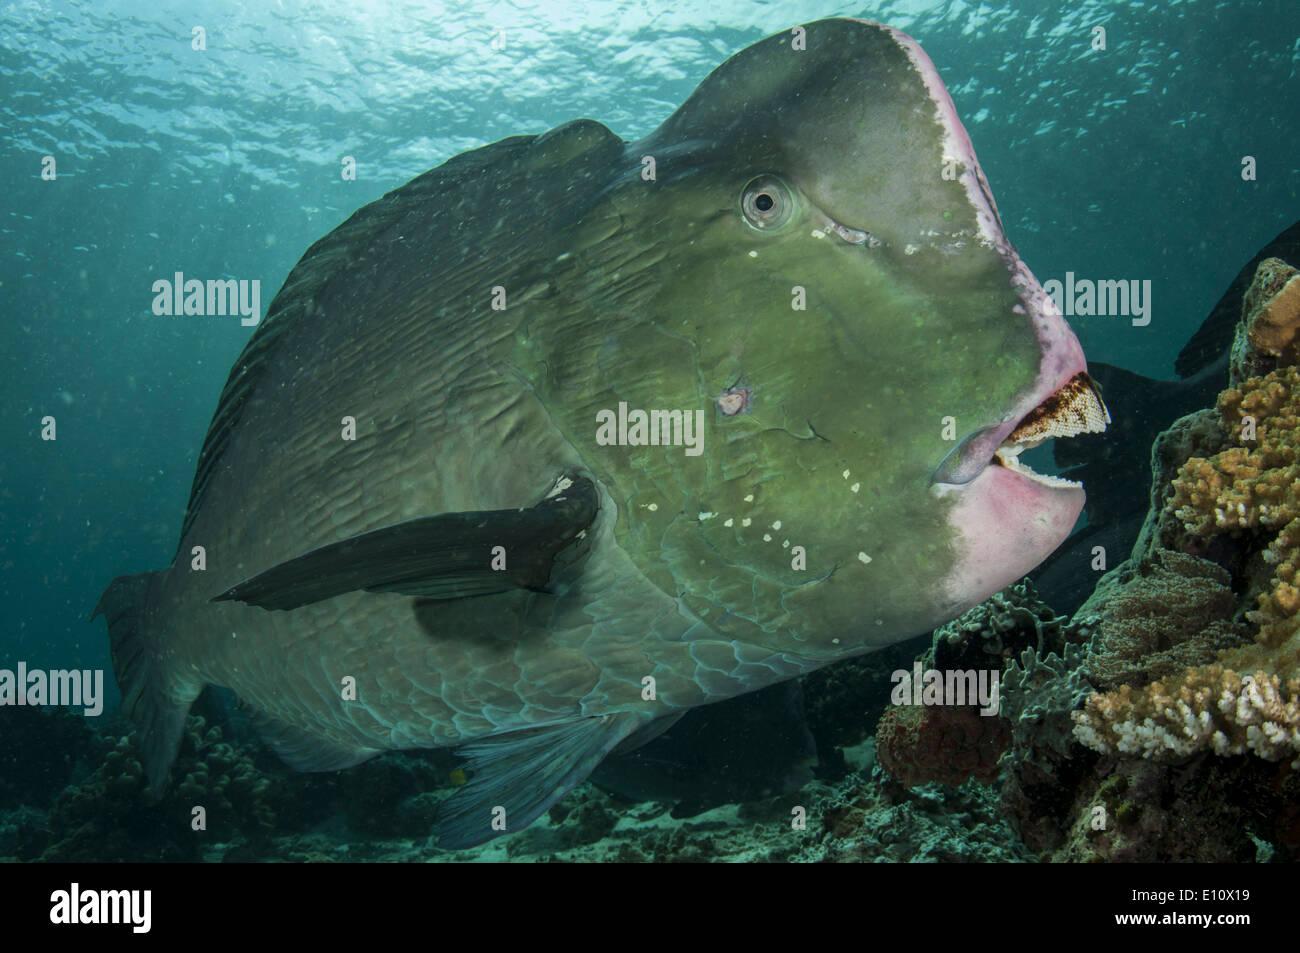 Humphead parrotfish, Malaysia Sipdan island (Bolbometopon muricatum) Stock Photo